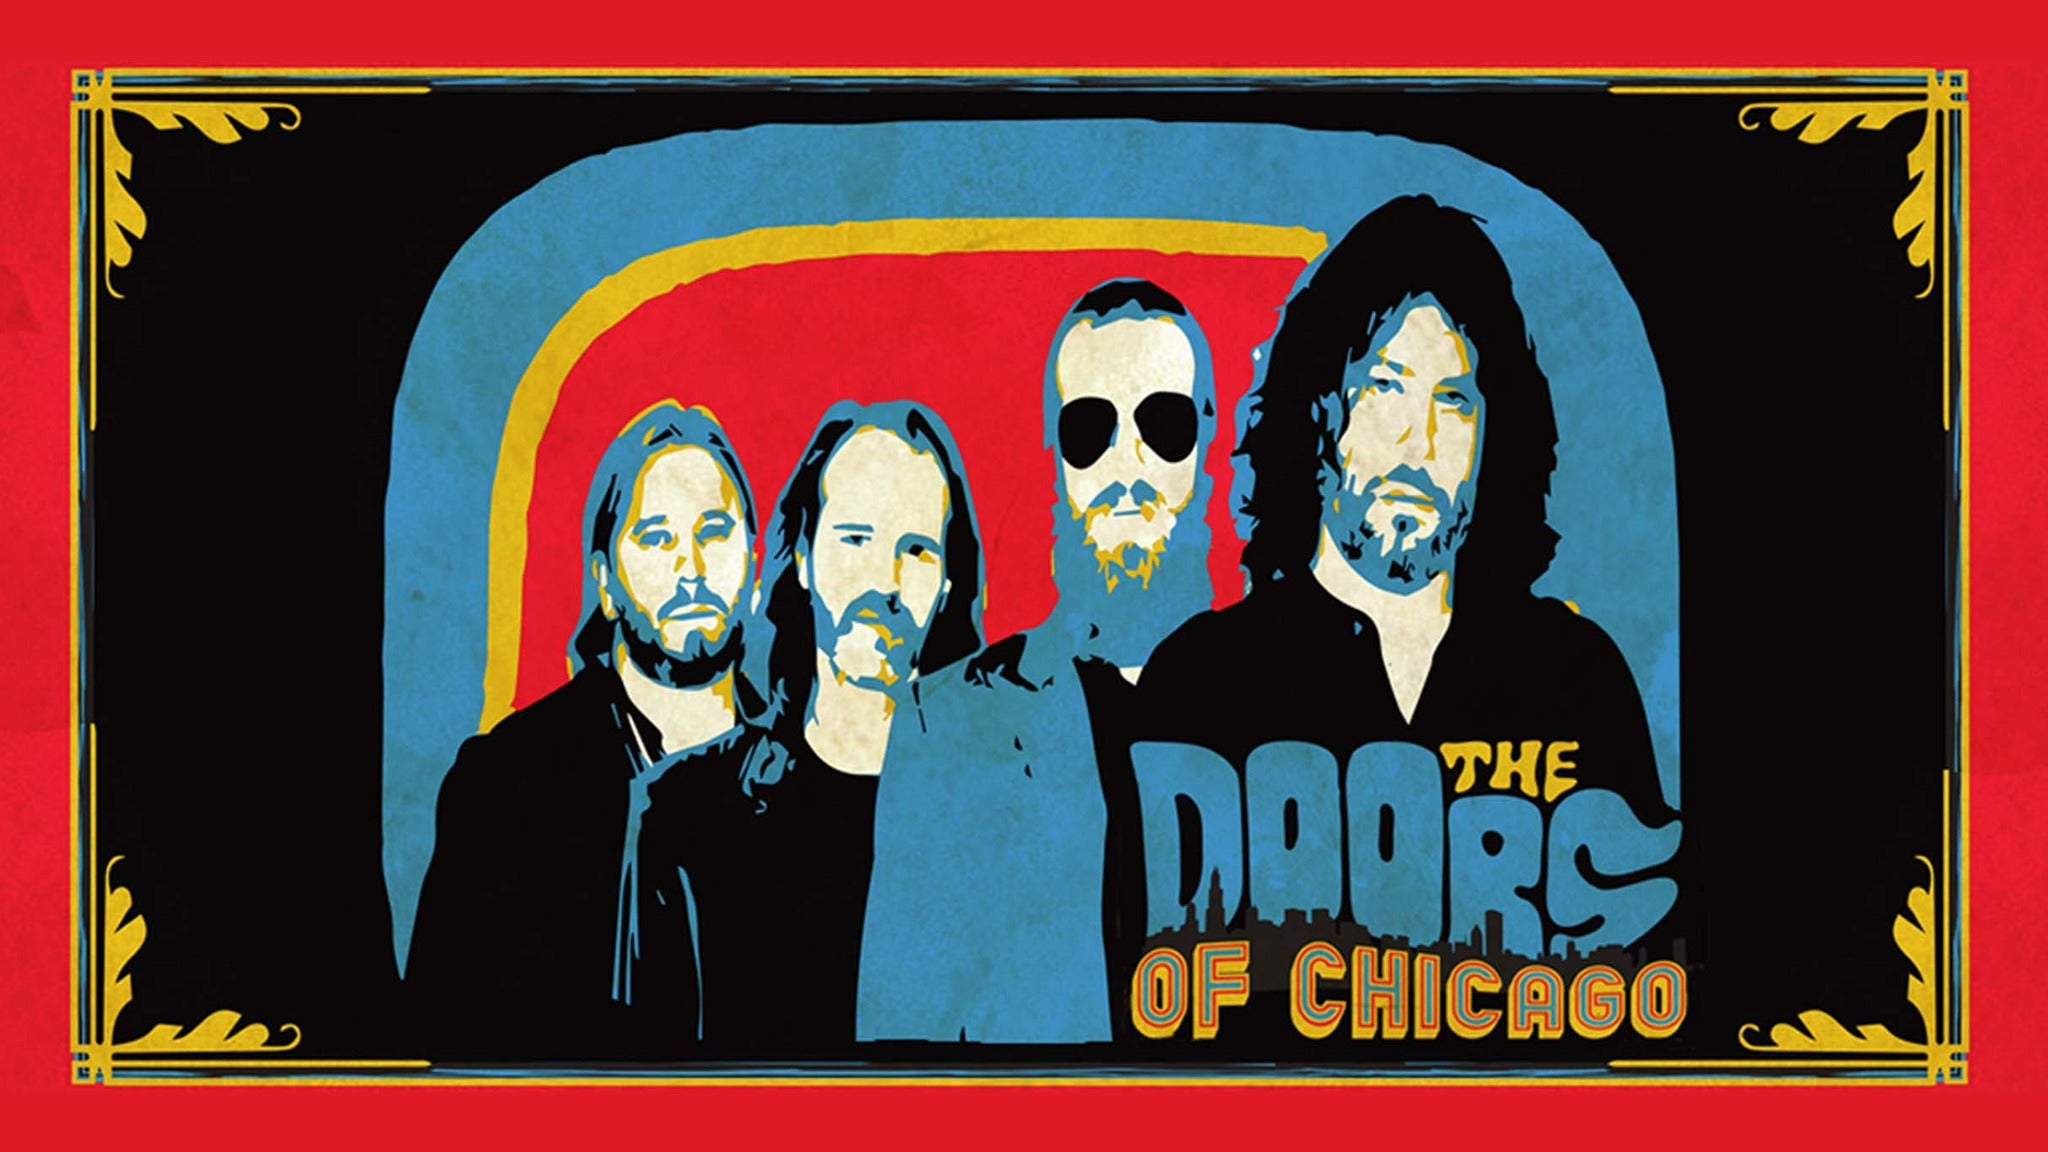 The Doors of Chicago - LIVE Doors Experience